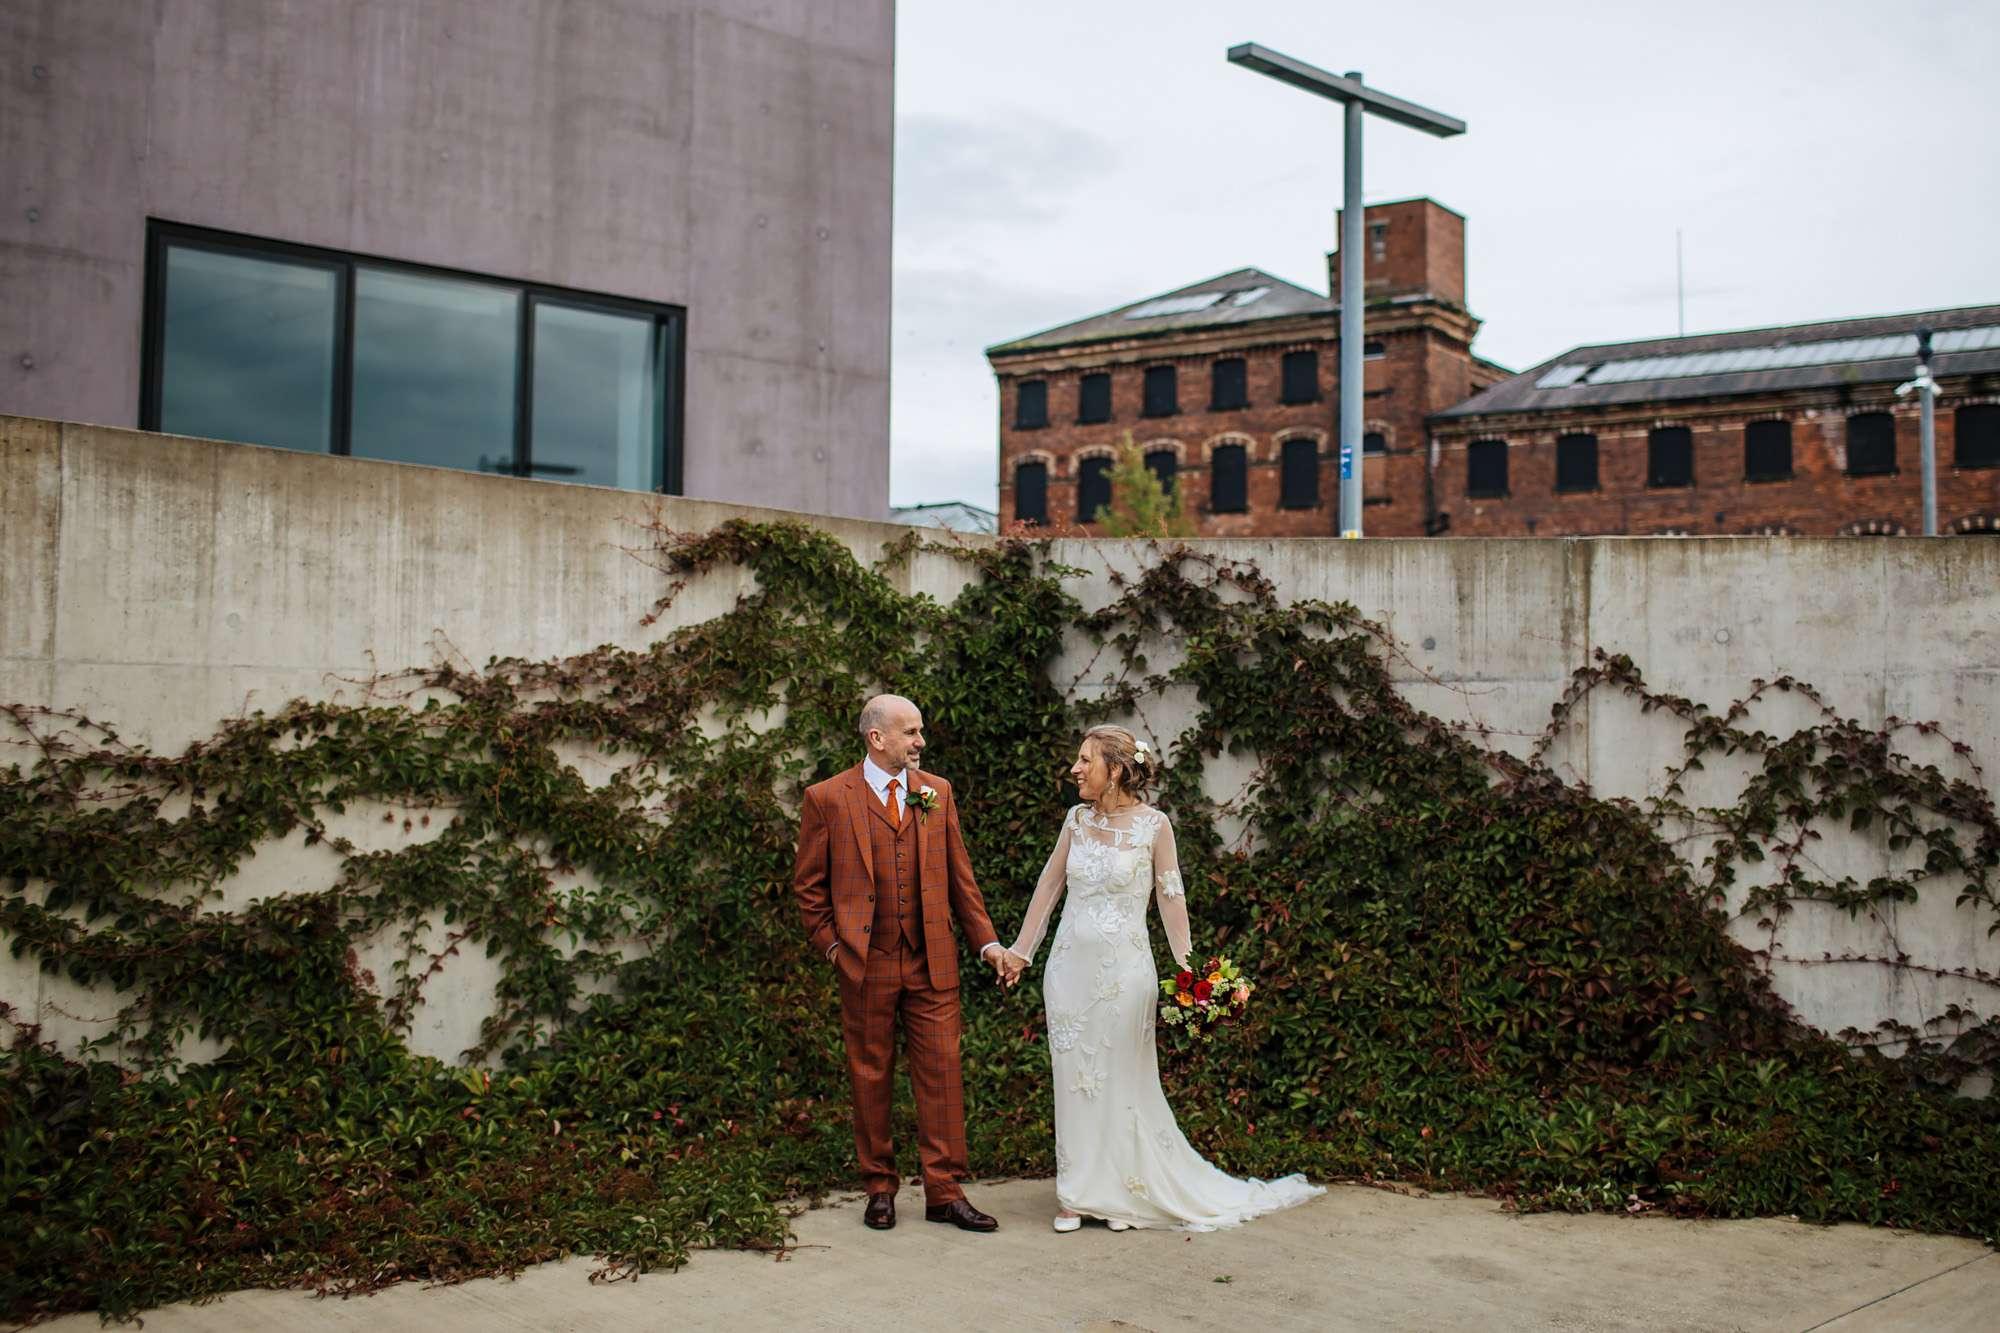 Newlyweds at their wedding at Hepworth Art Gallery